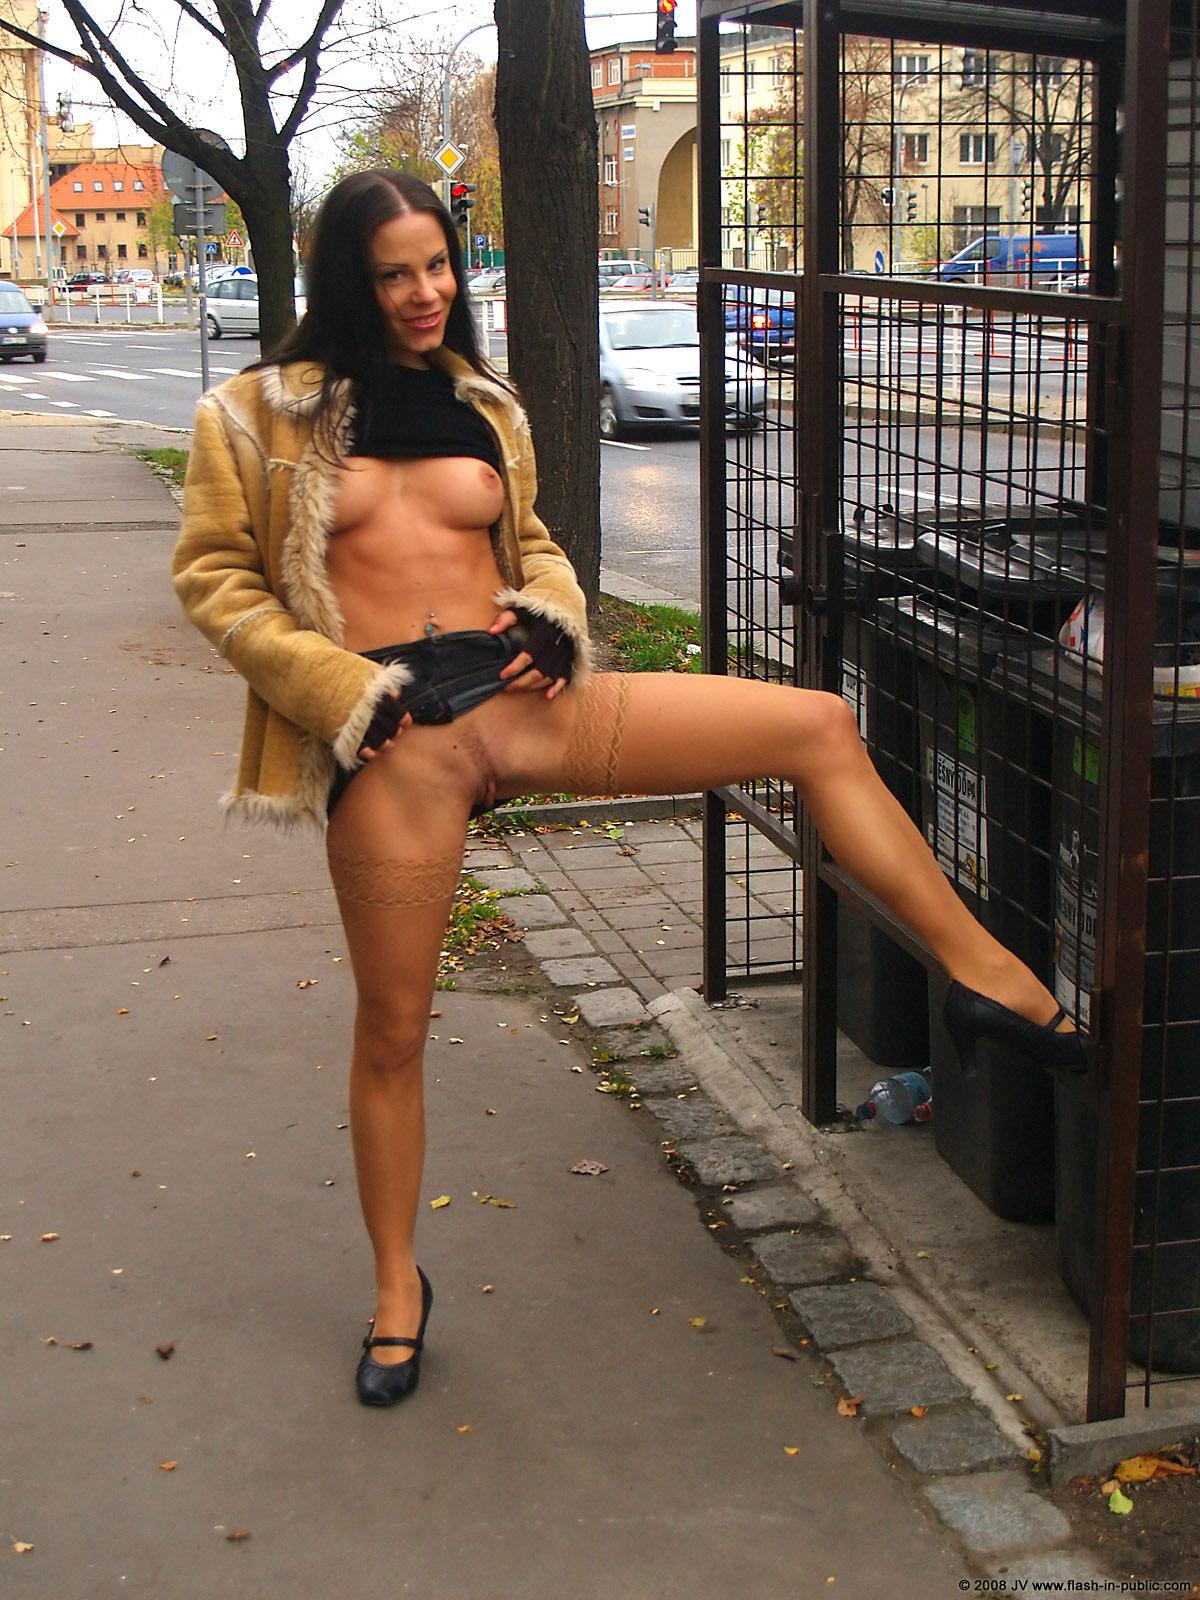 alexandra-g-bottomless-stockings-flash-in-public-23